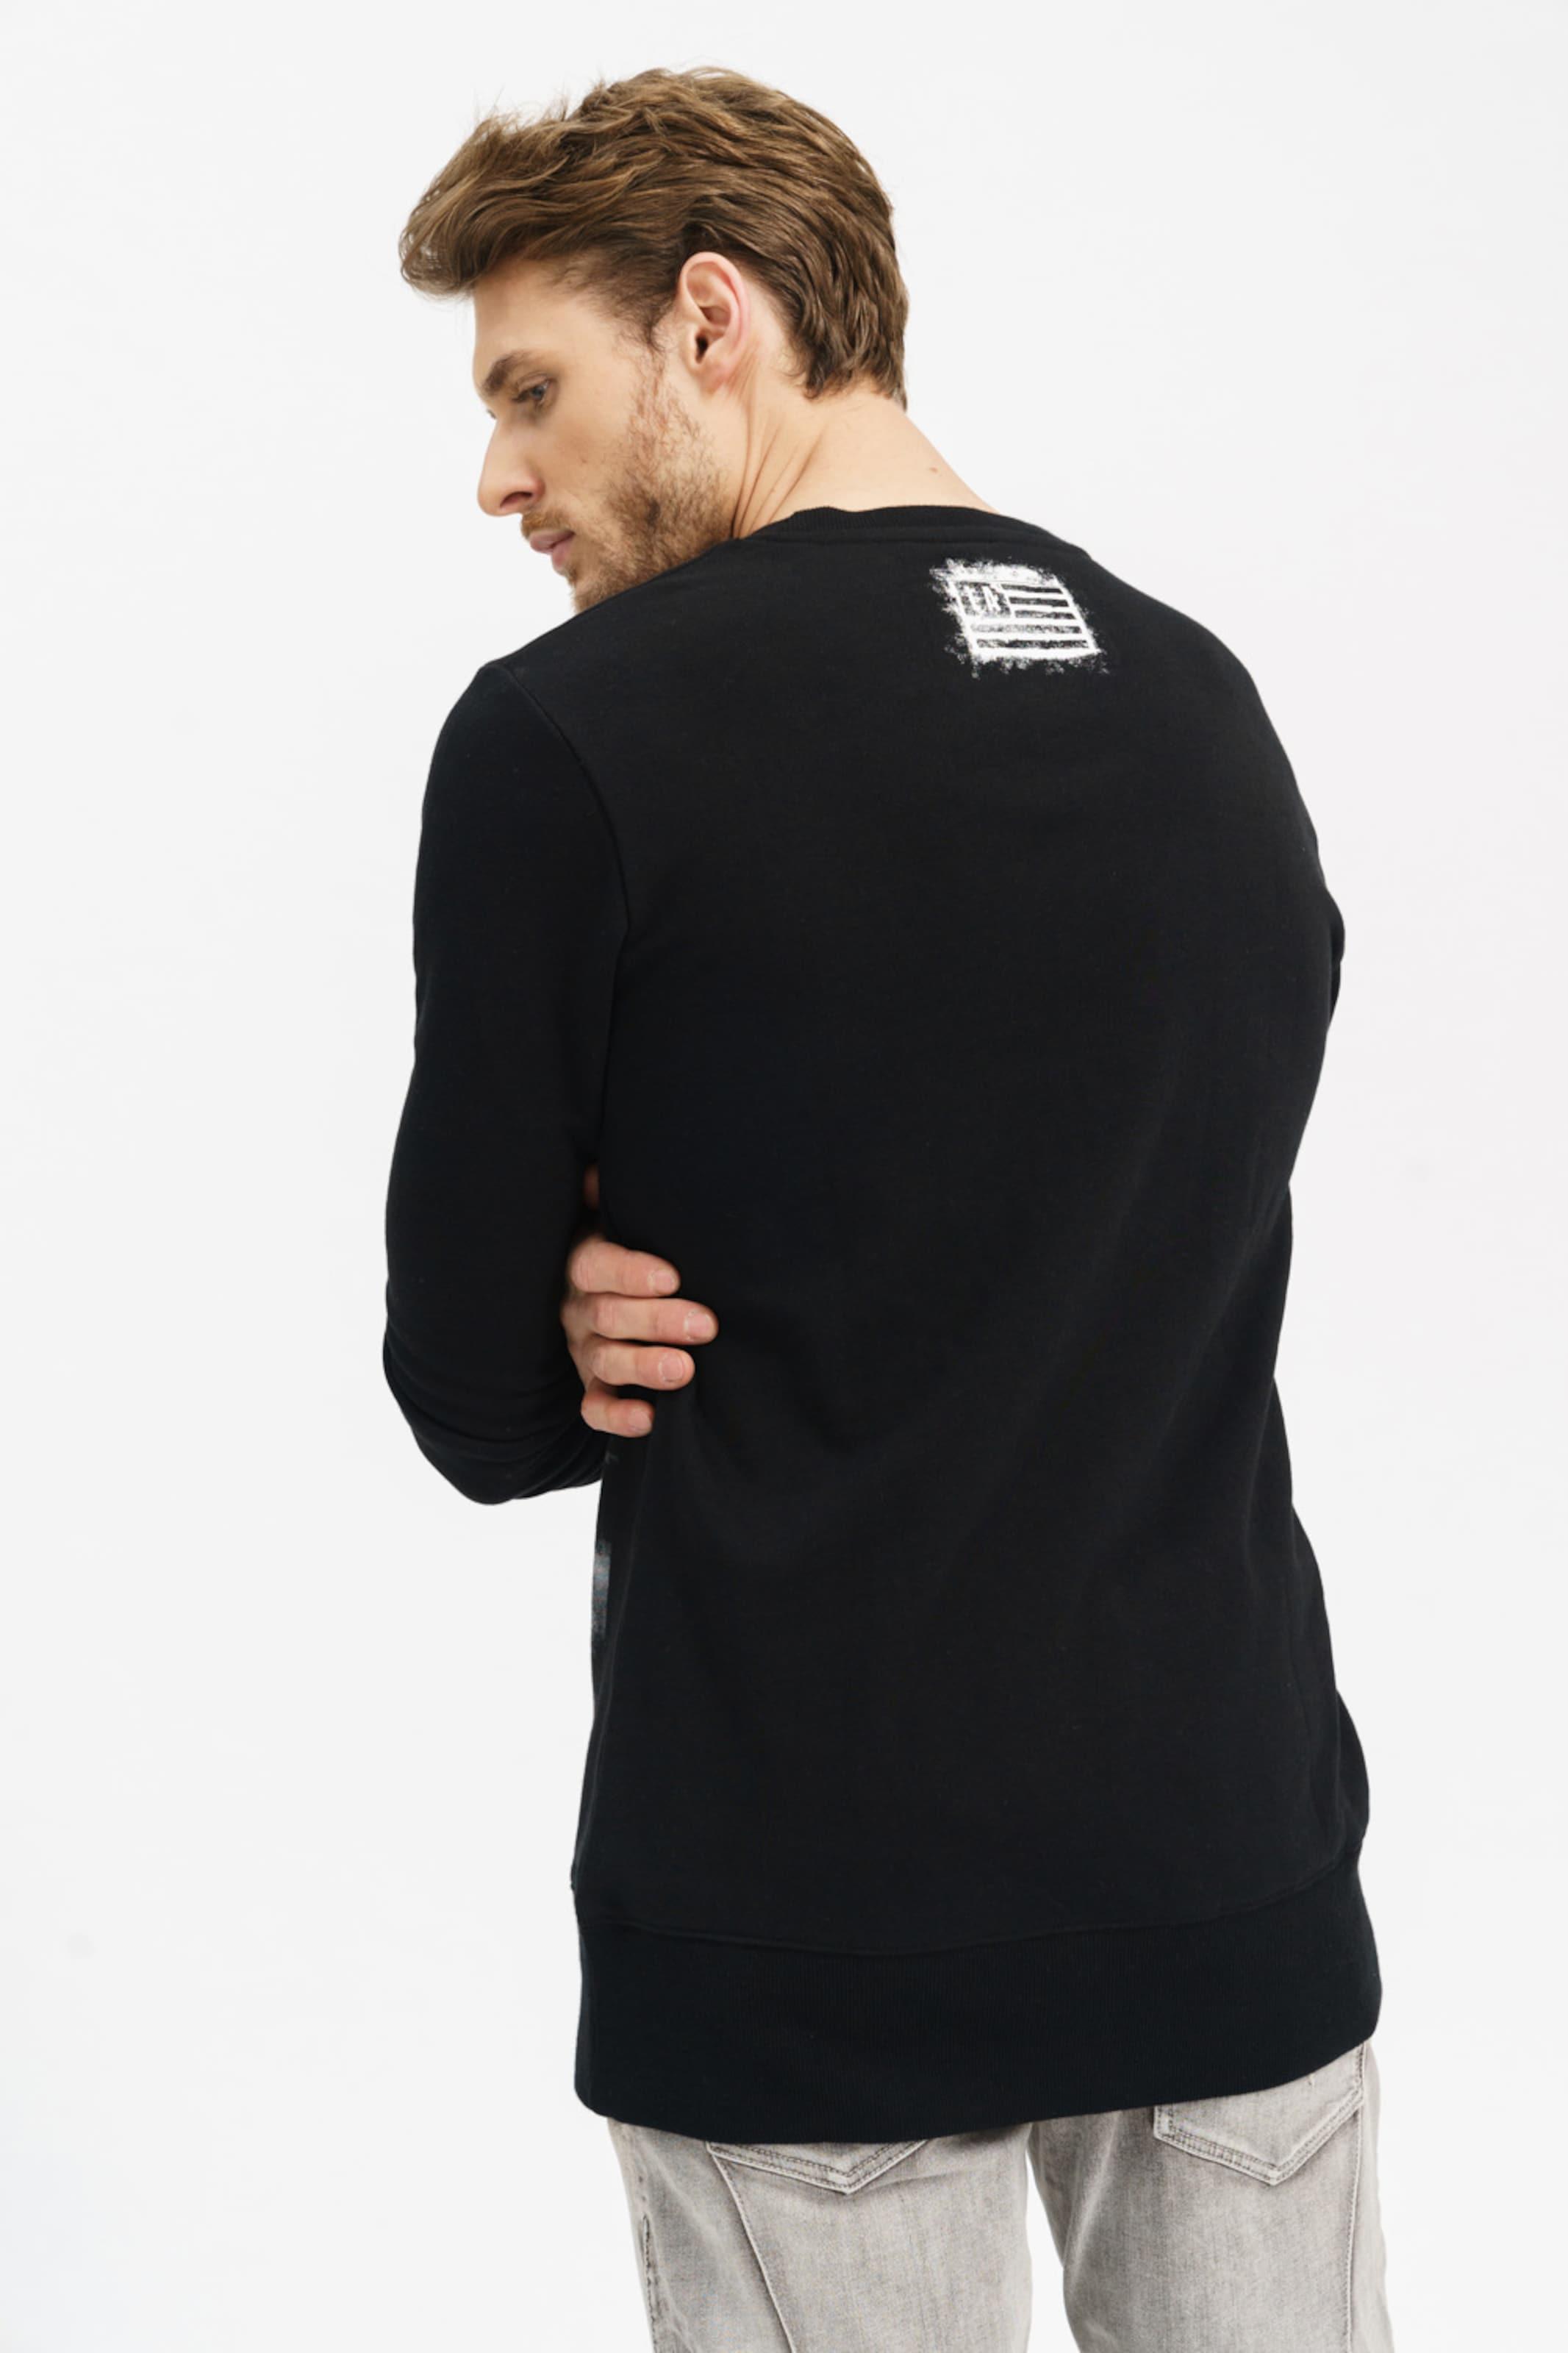 'khal' In Trueprodigy Langarmshirt SchwarzWeiß iXOZPkuT